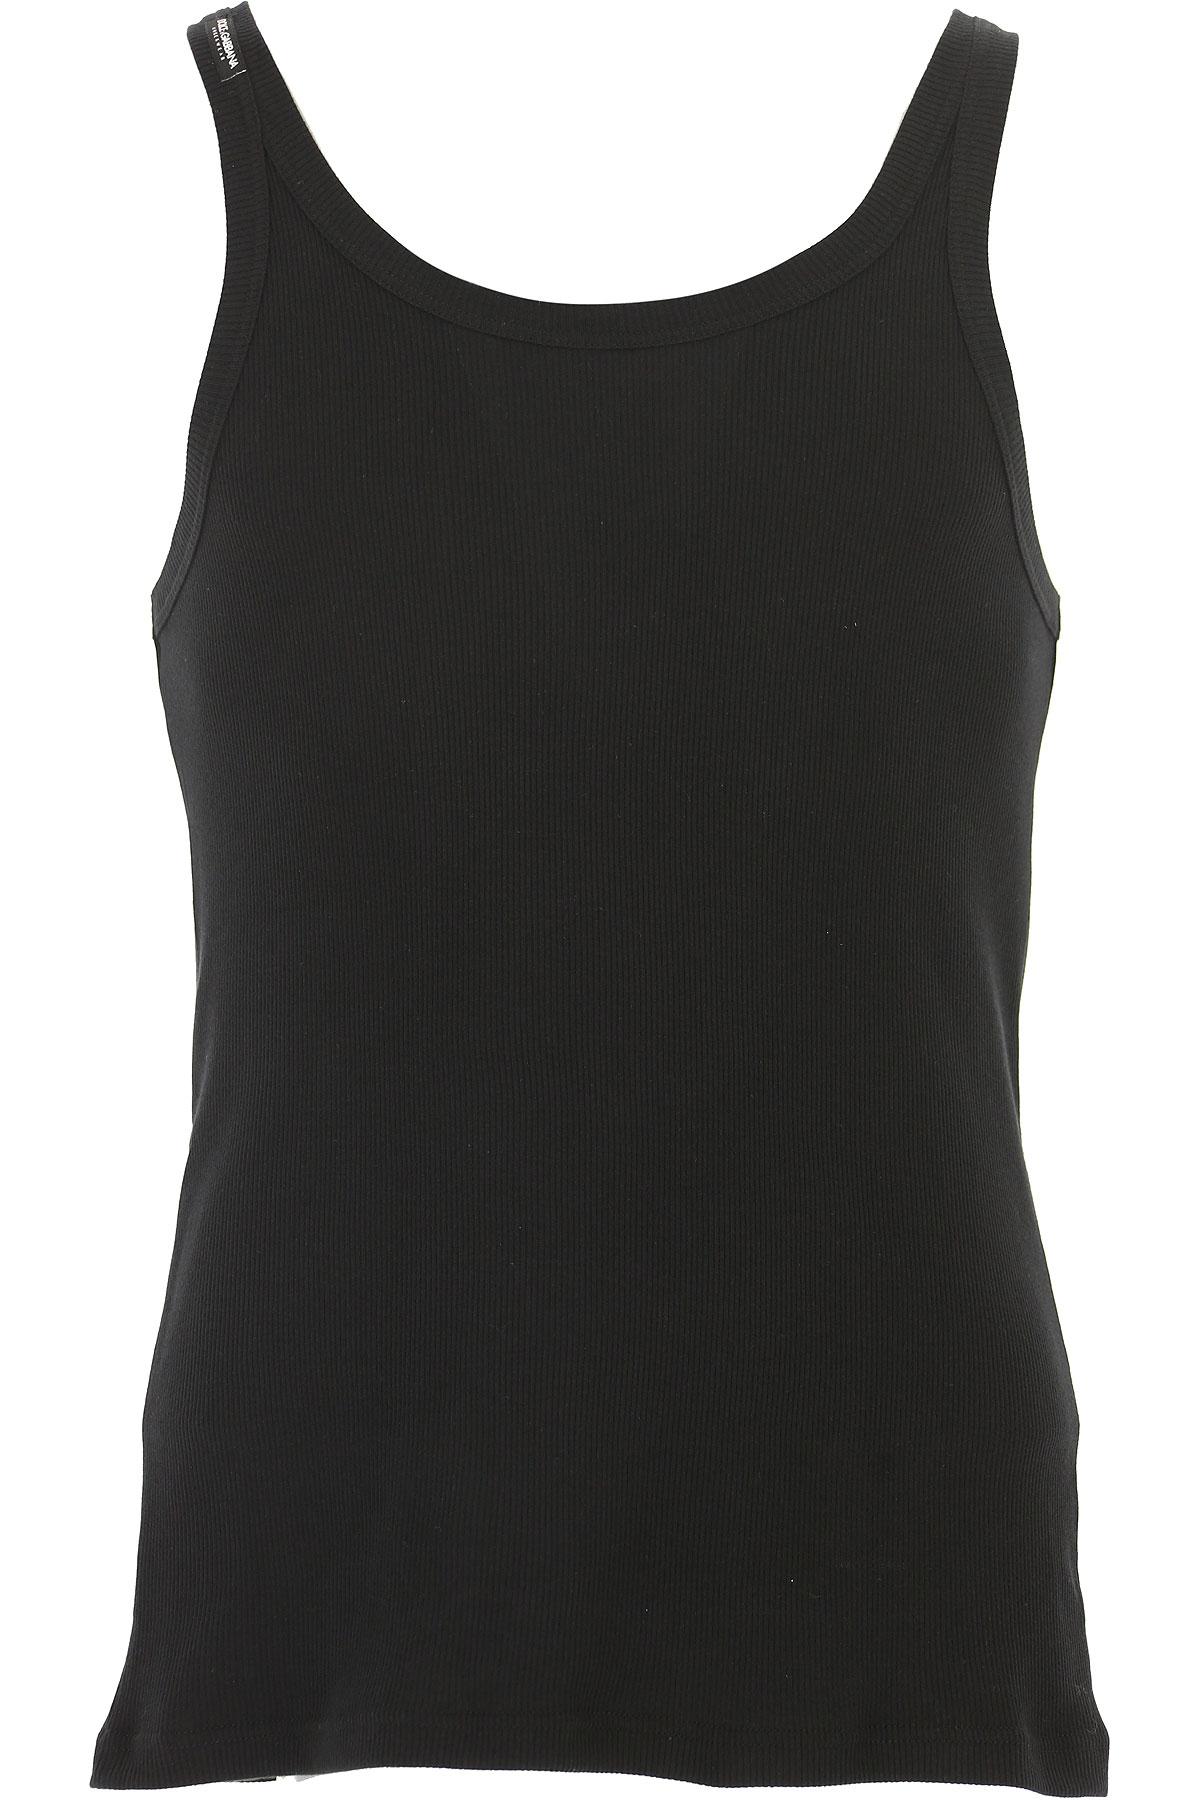 Image of Dolce & Gabbana Tank Top for Men, Black, Cotton, 2017, M (EU 4) L (EU 5)